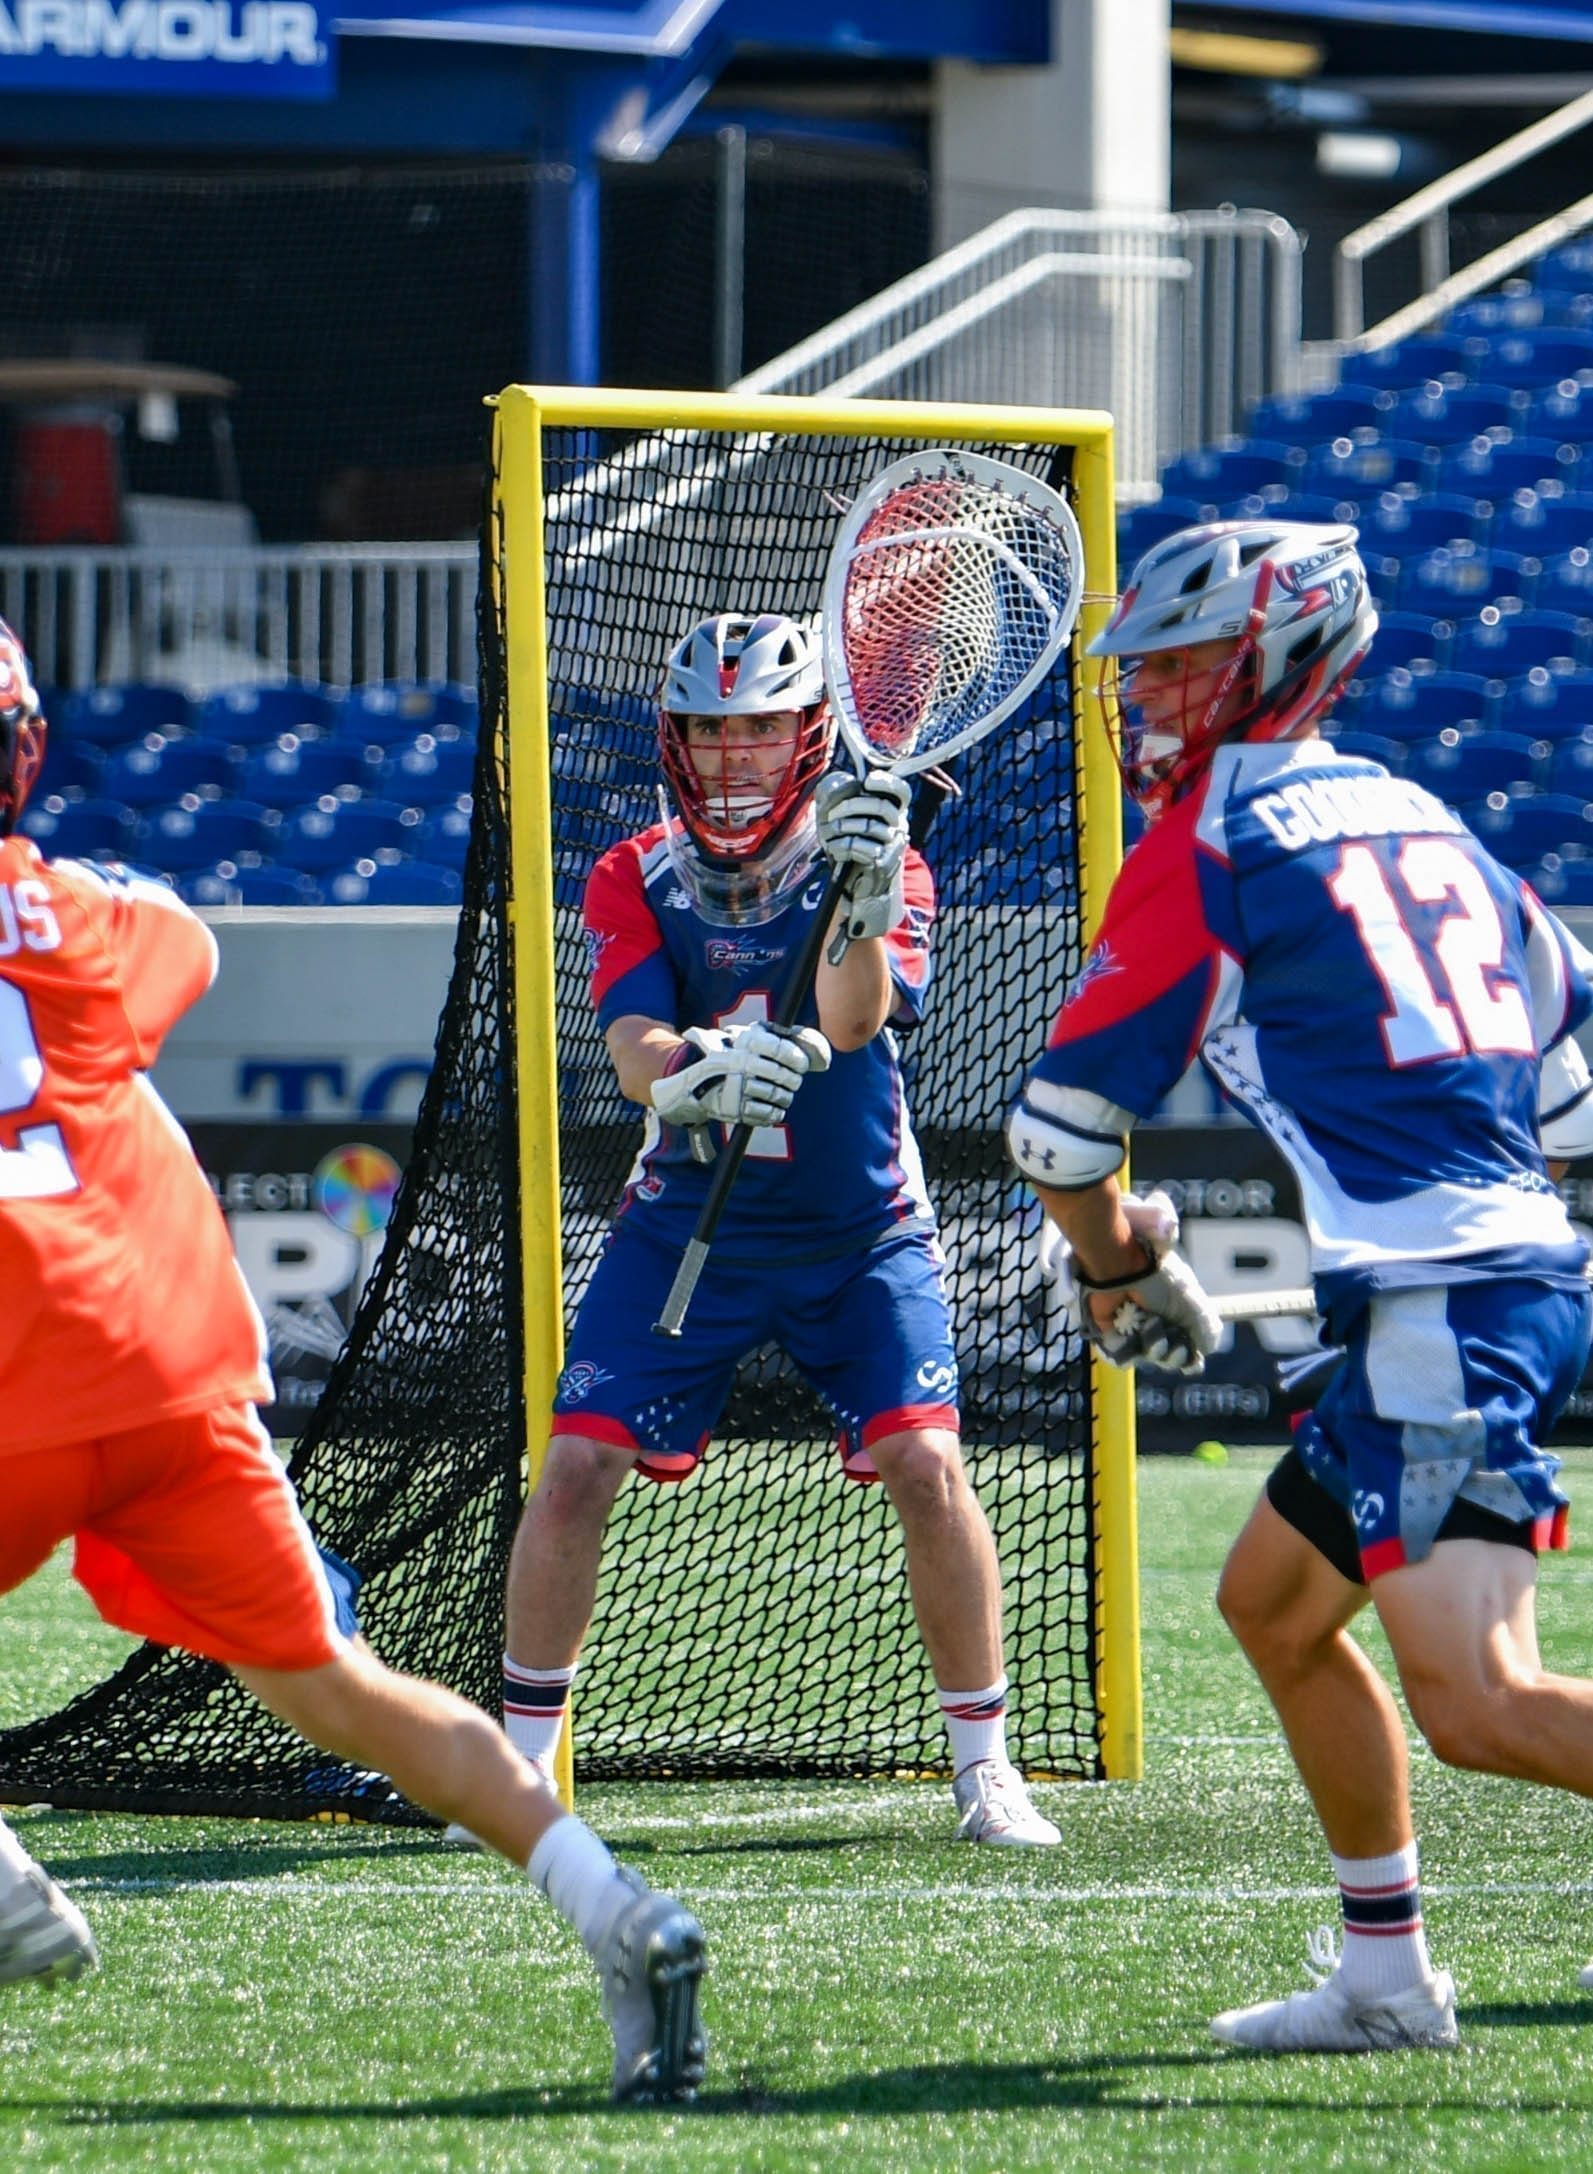 Barrage vs Cannons Pretty Instant Major League Lacrosse MLL